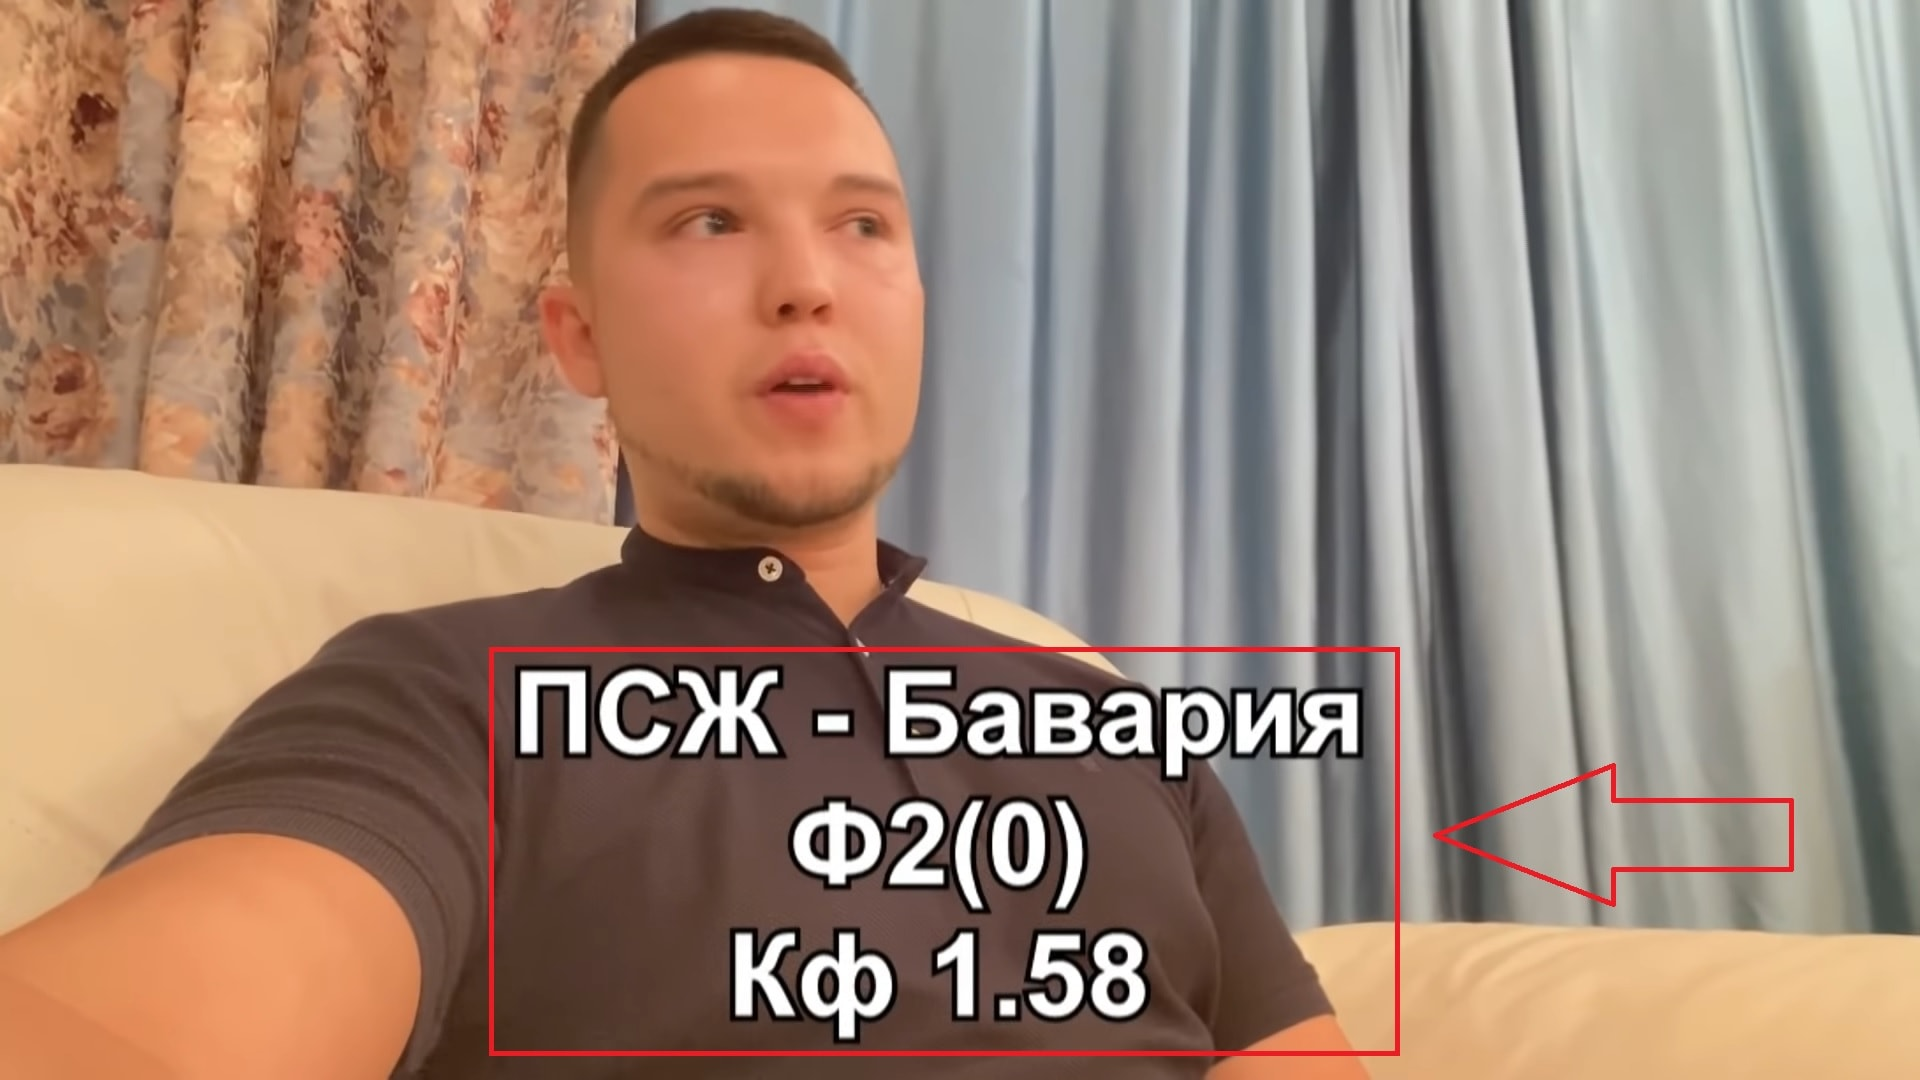 Скриншот с видеоролика на Ютуб